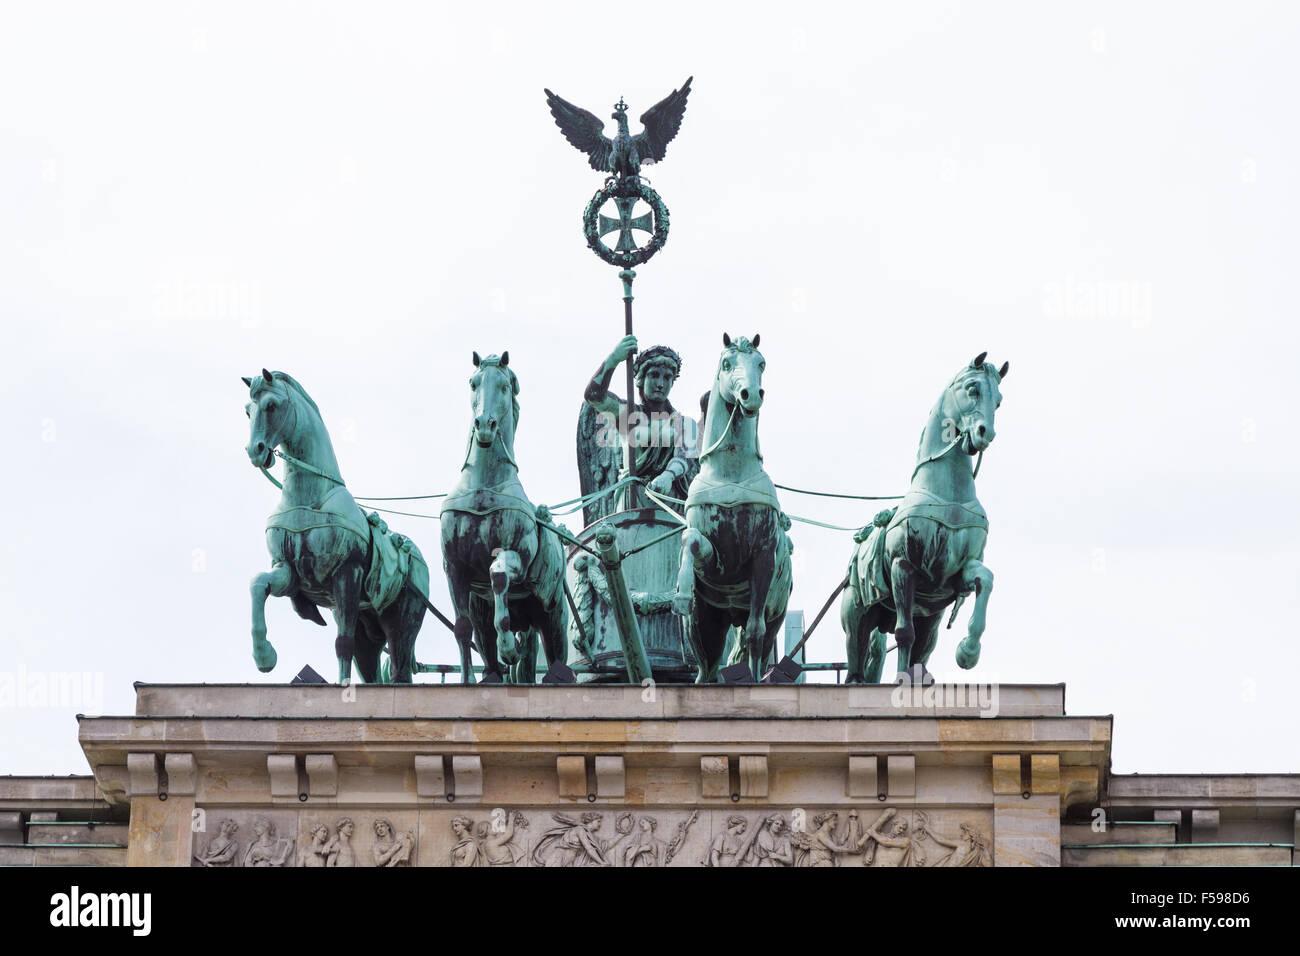 File:Quadriga of Arc de Triomphe du Carrousel, May 2010.jpg ...